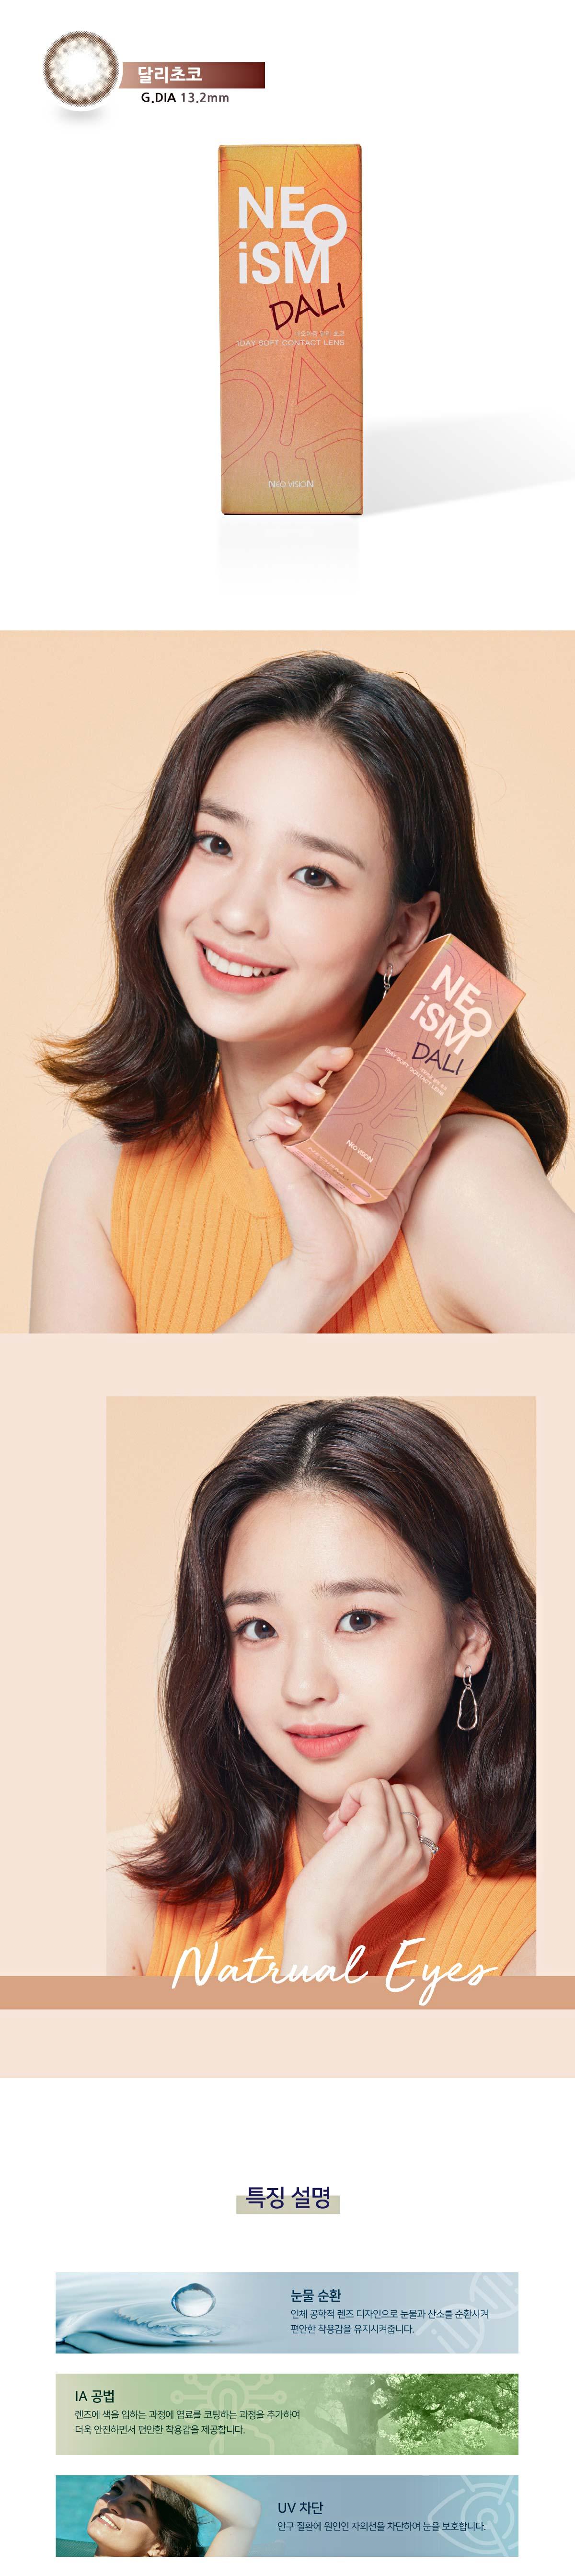 neoism-1day-dali-cohco-korean-colored-contact-lenses-22.jpg